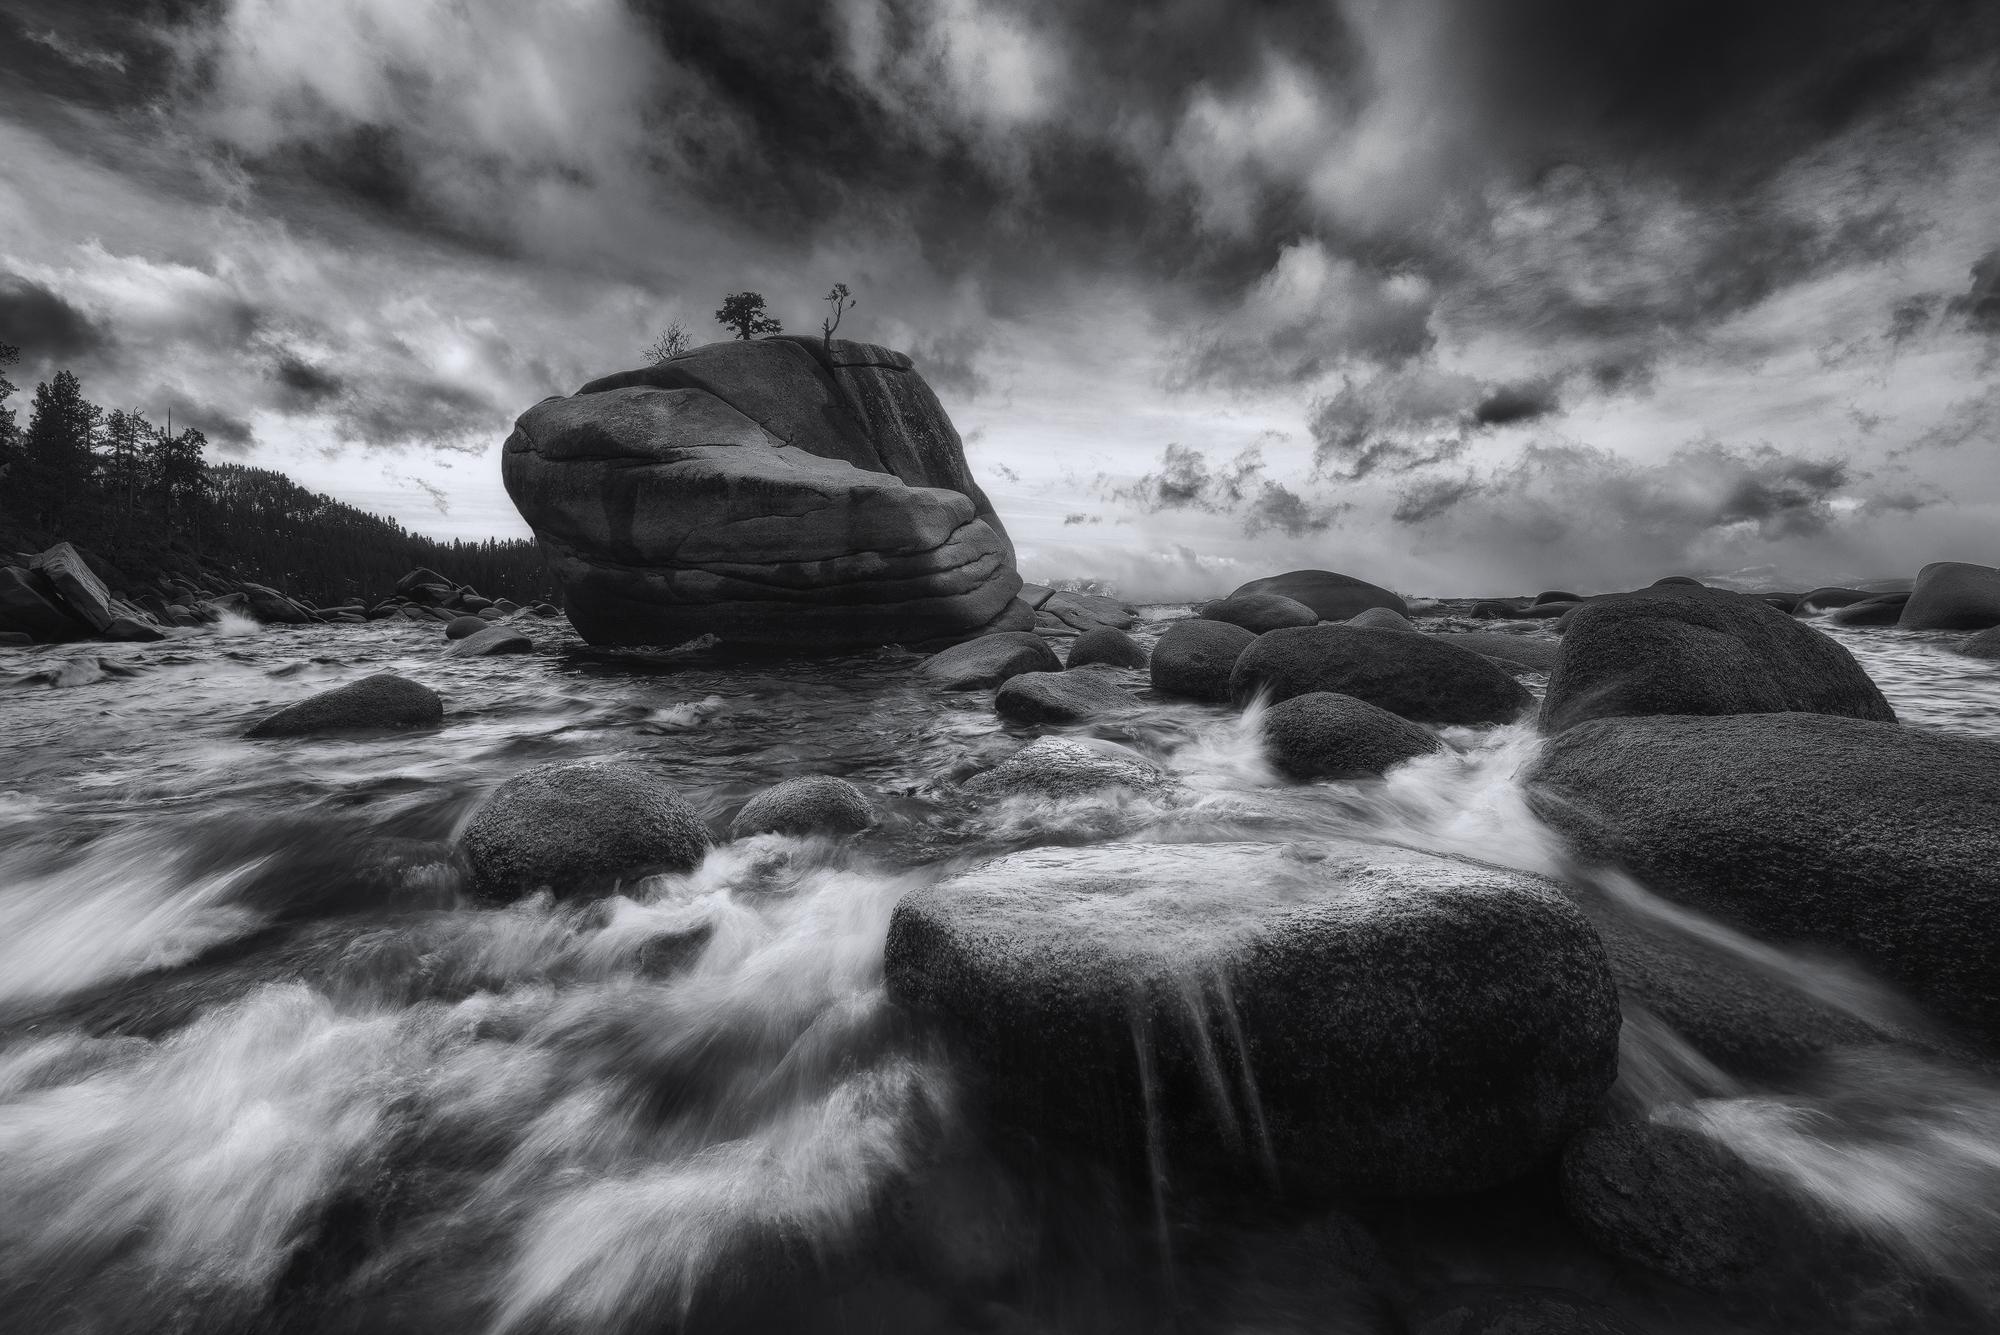 Bonsai_Rock_Tahoe_BW.jpg